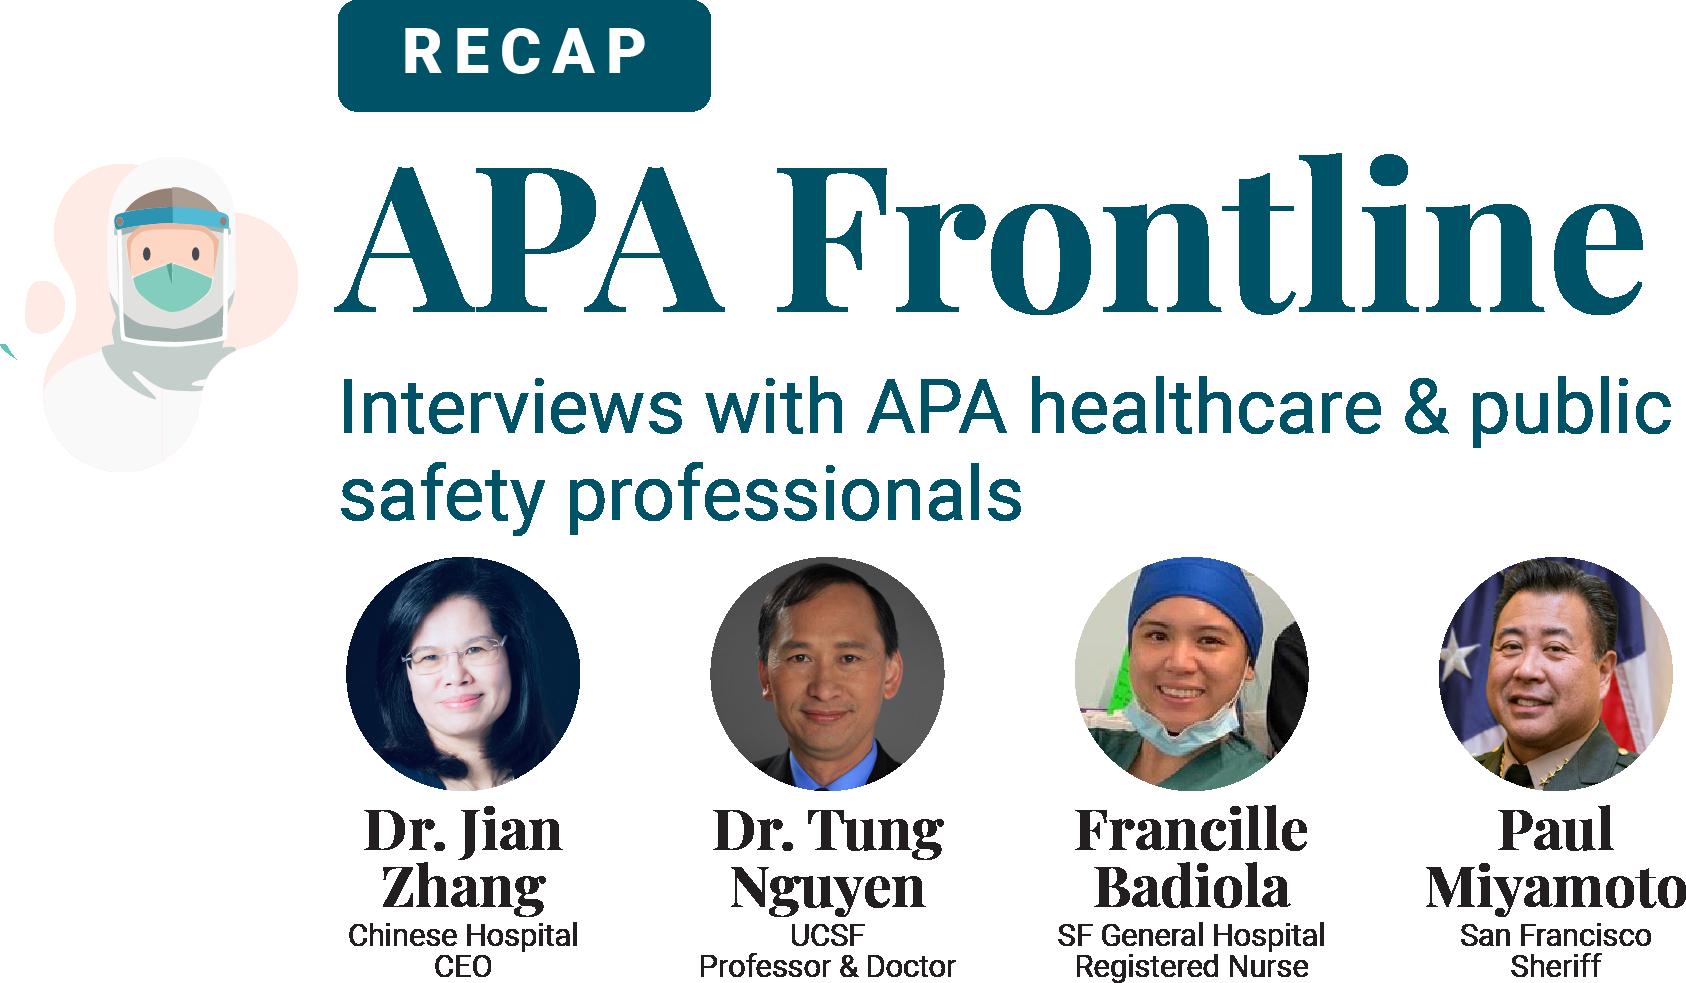 Recap APA Frontline Interviews